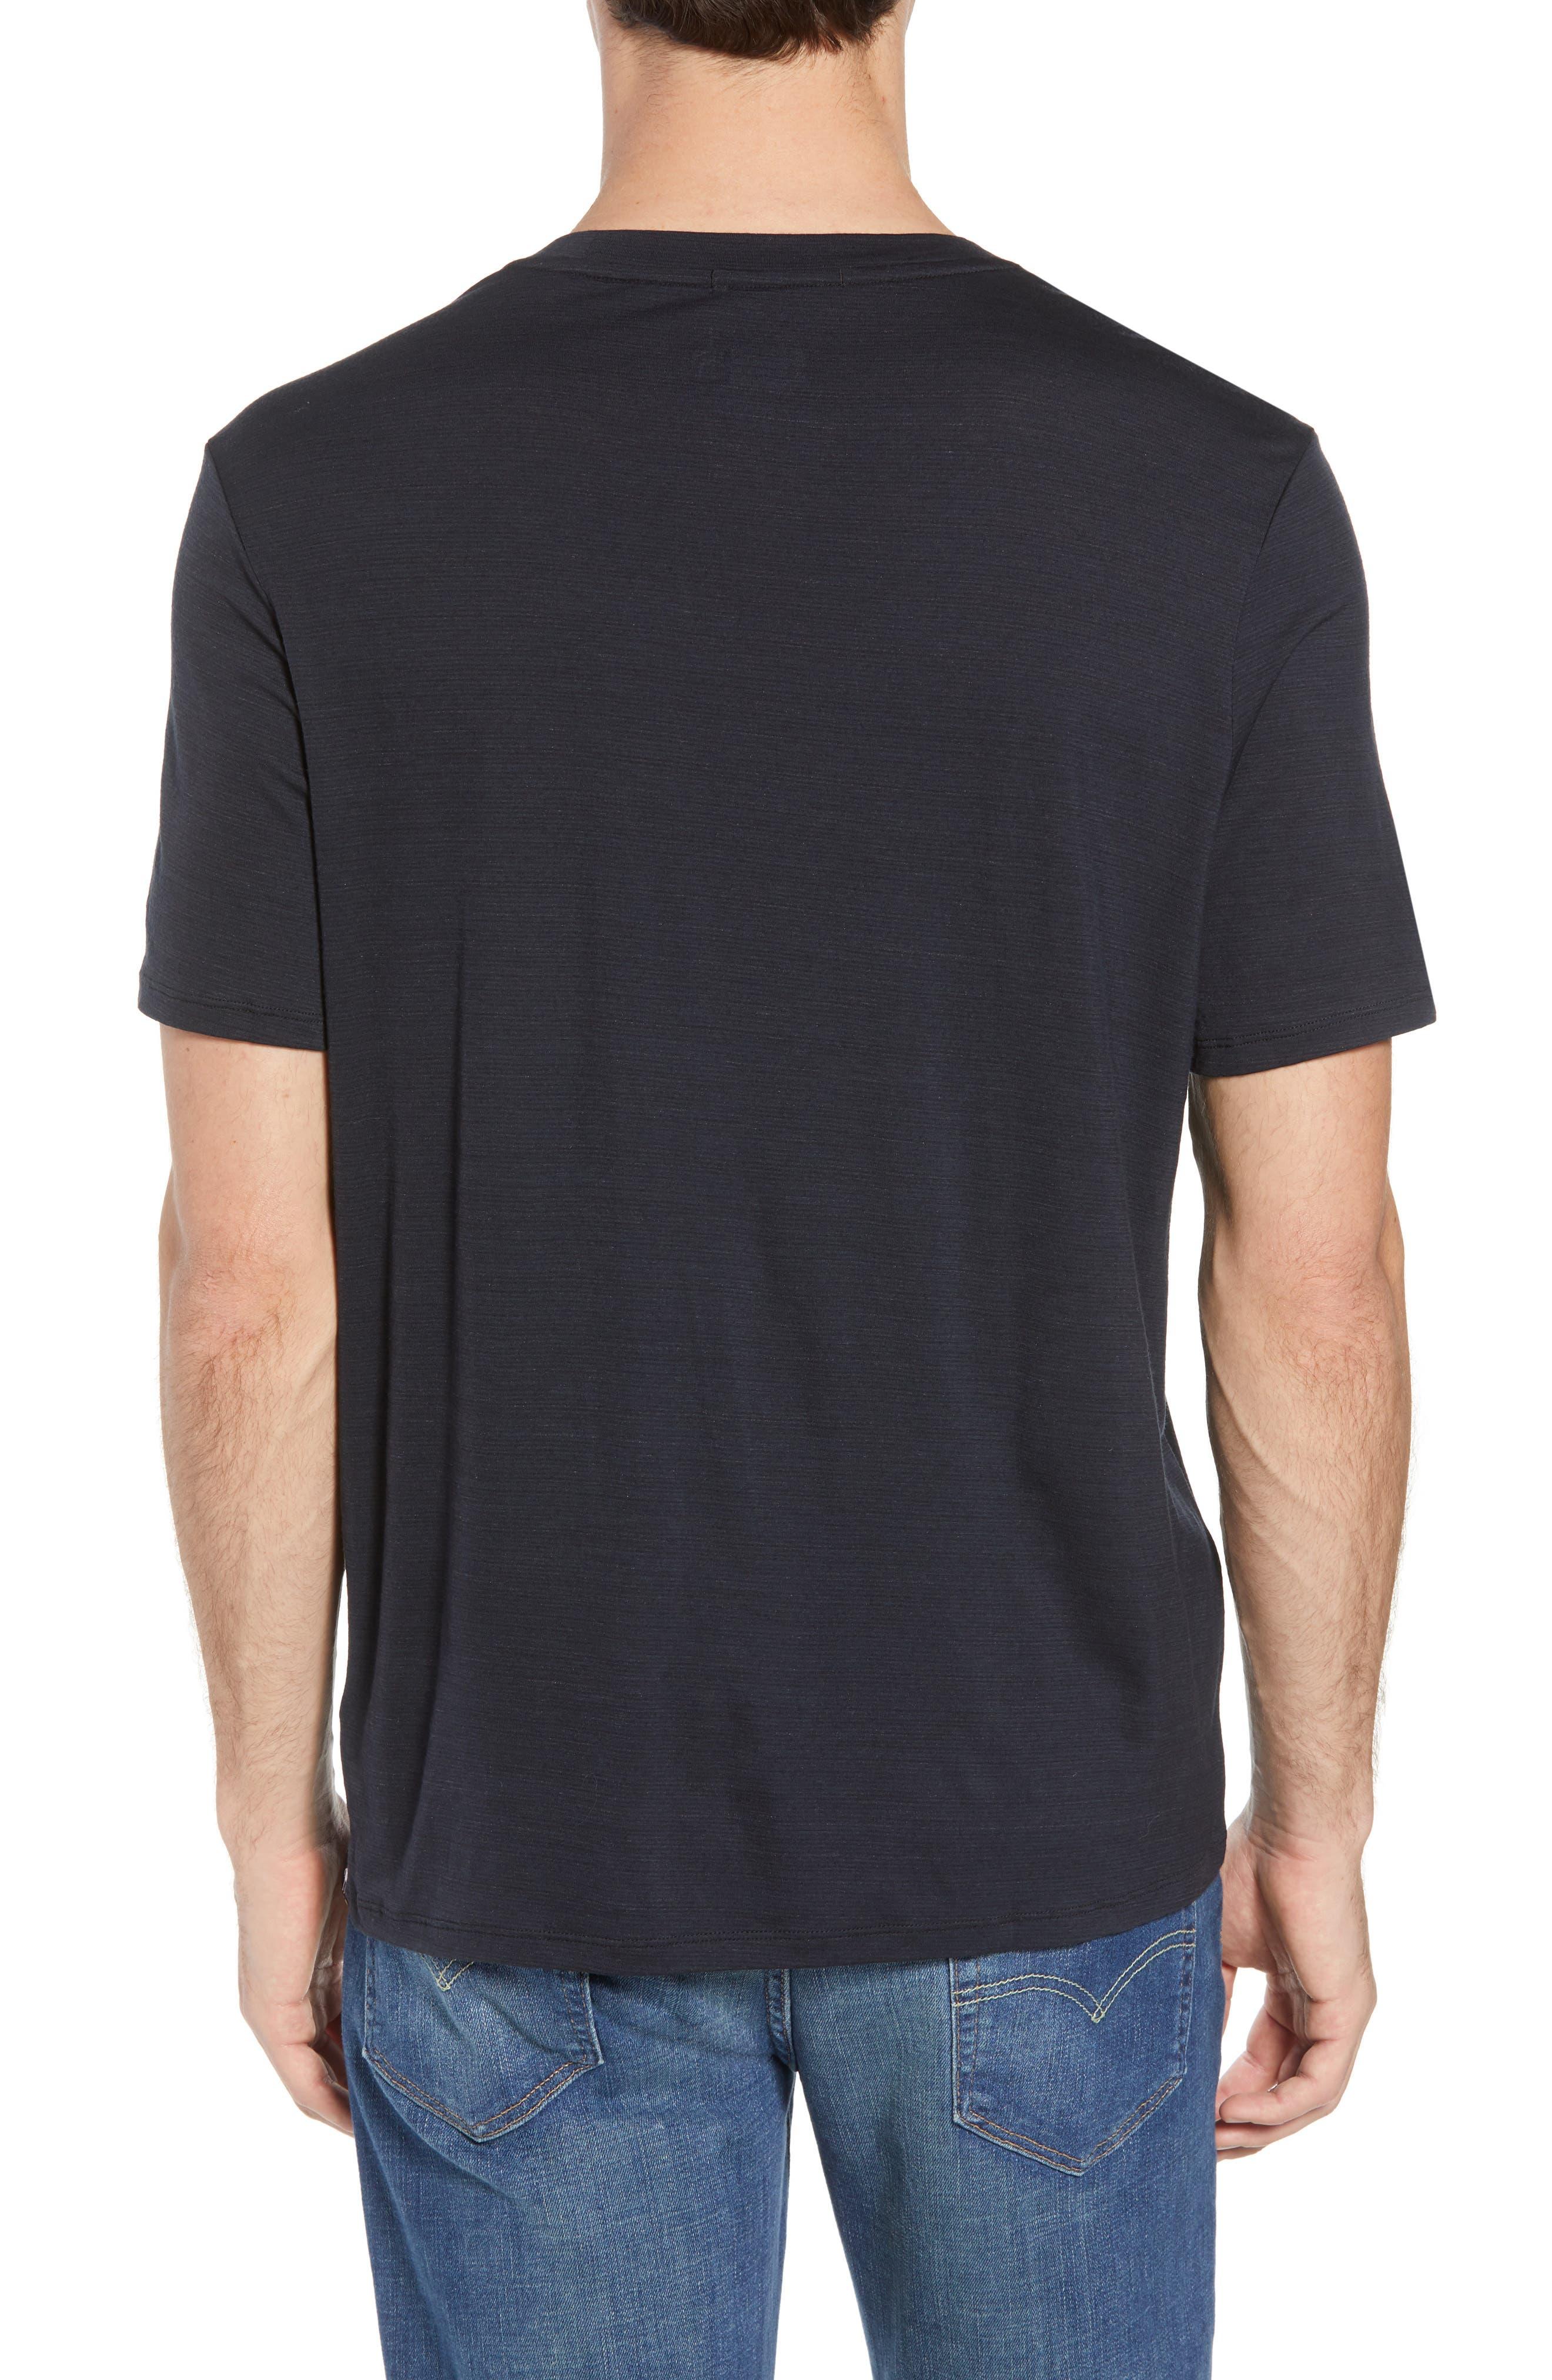 Merino 150 Wool Blend T-Shirt,                             Alternate thumbnail 2, color,                             020